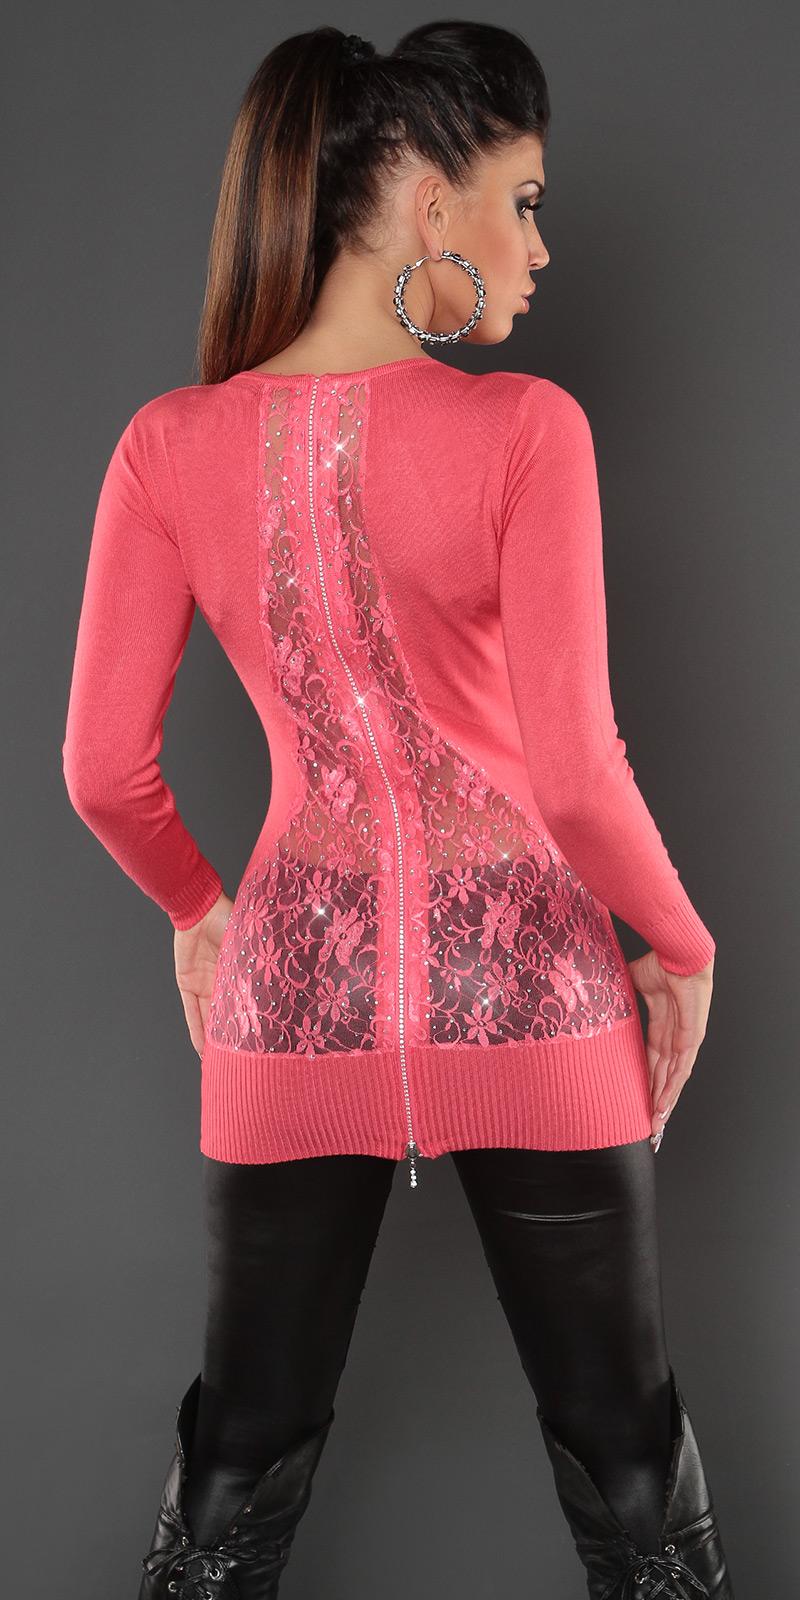 koucla longpulli spitze zip strass pullover longpullover strickkleid sweater cor ebay. Black Bedroom Furniture Sets. Home Design Ideas